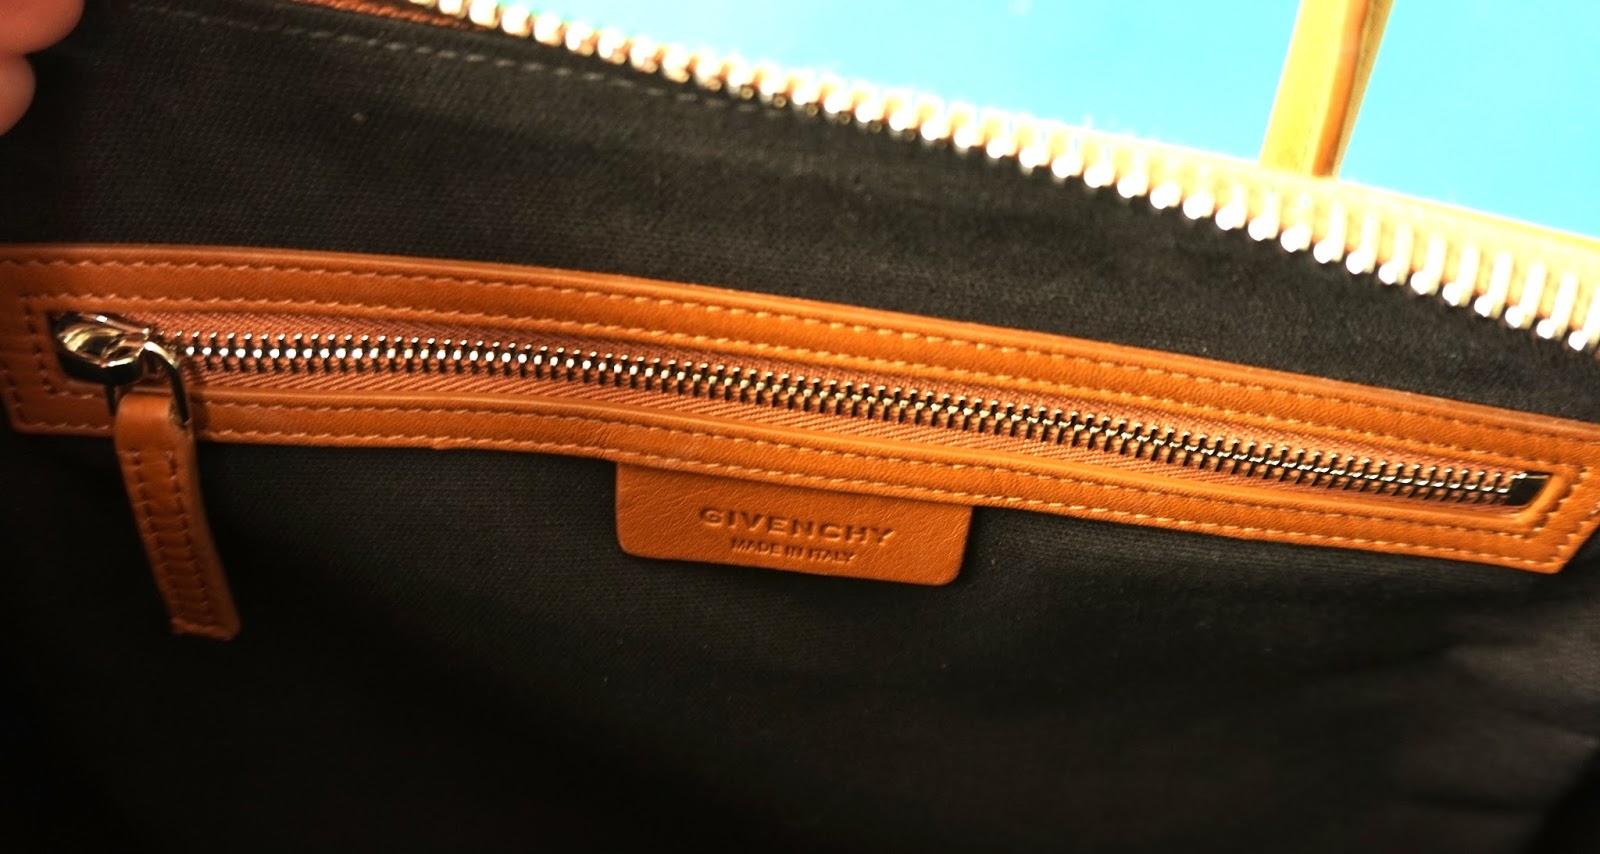 47ed84023928 Bag Review  Givenchy Antigona Medium Metal Edge in Hazel